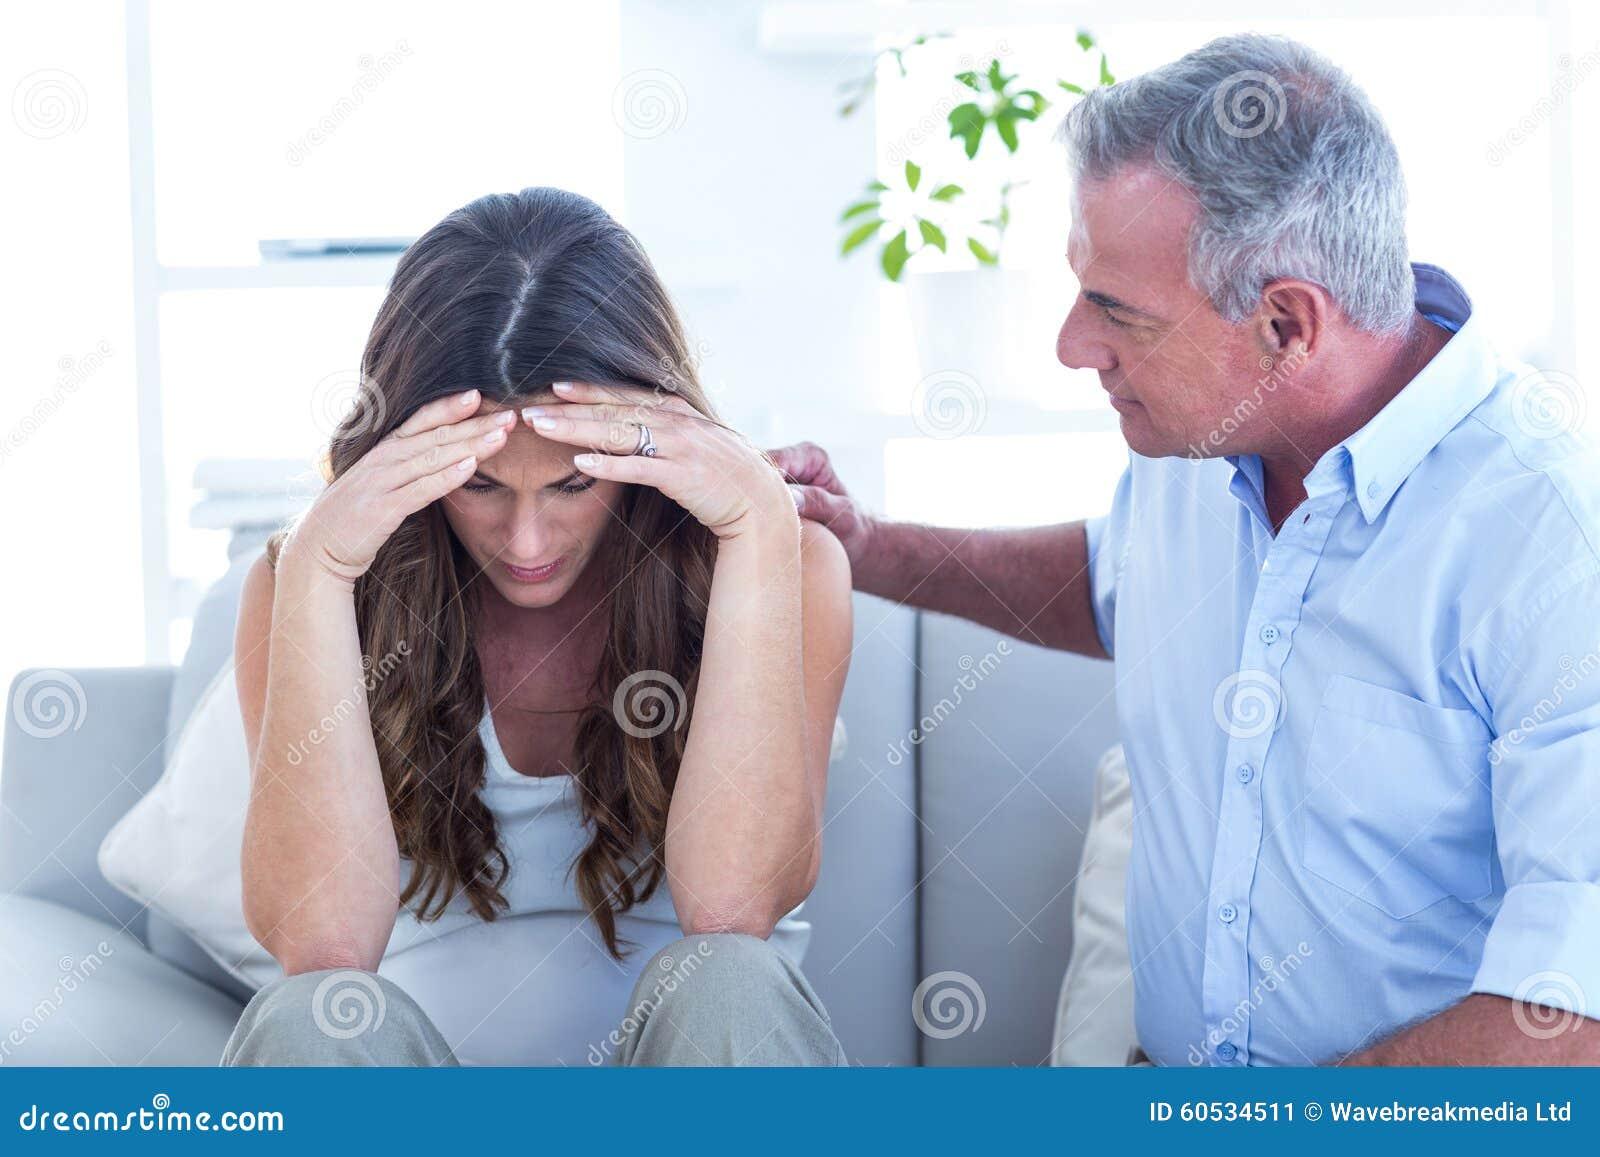 Psychiatrist advising pregenat woman in clinic